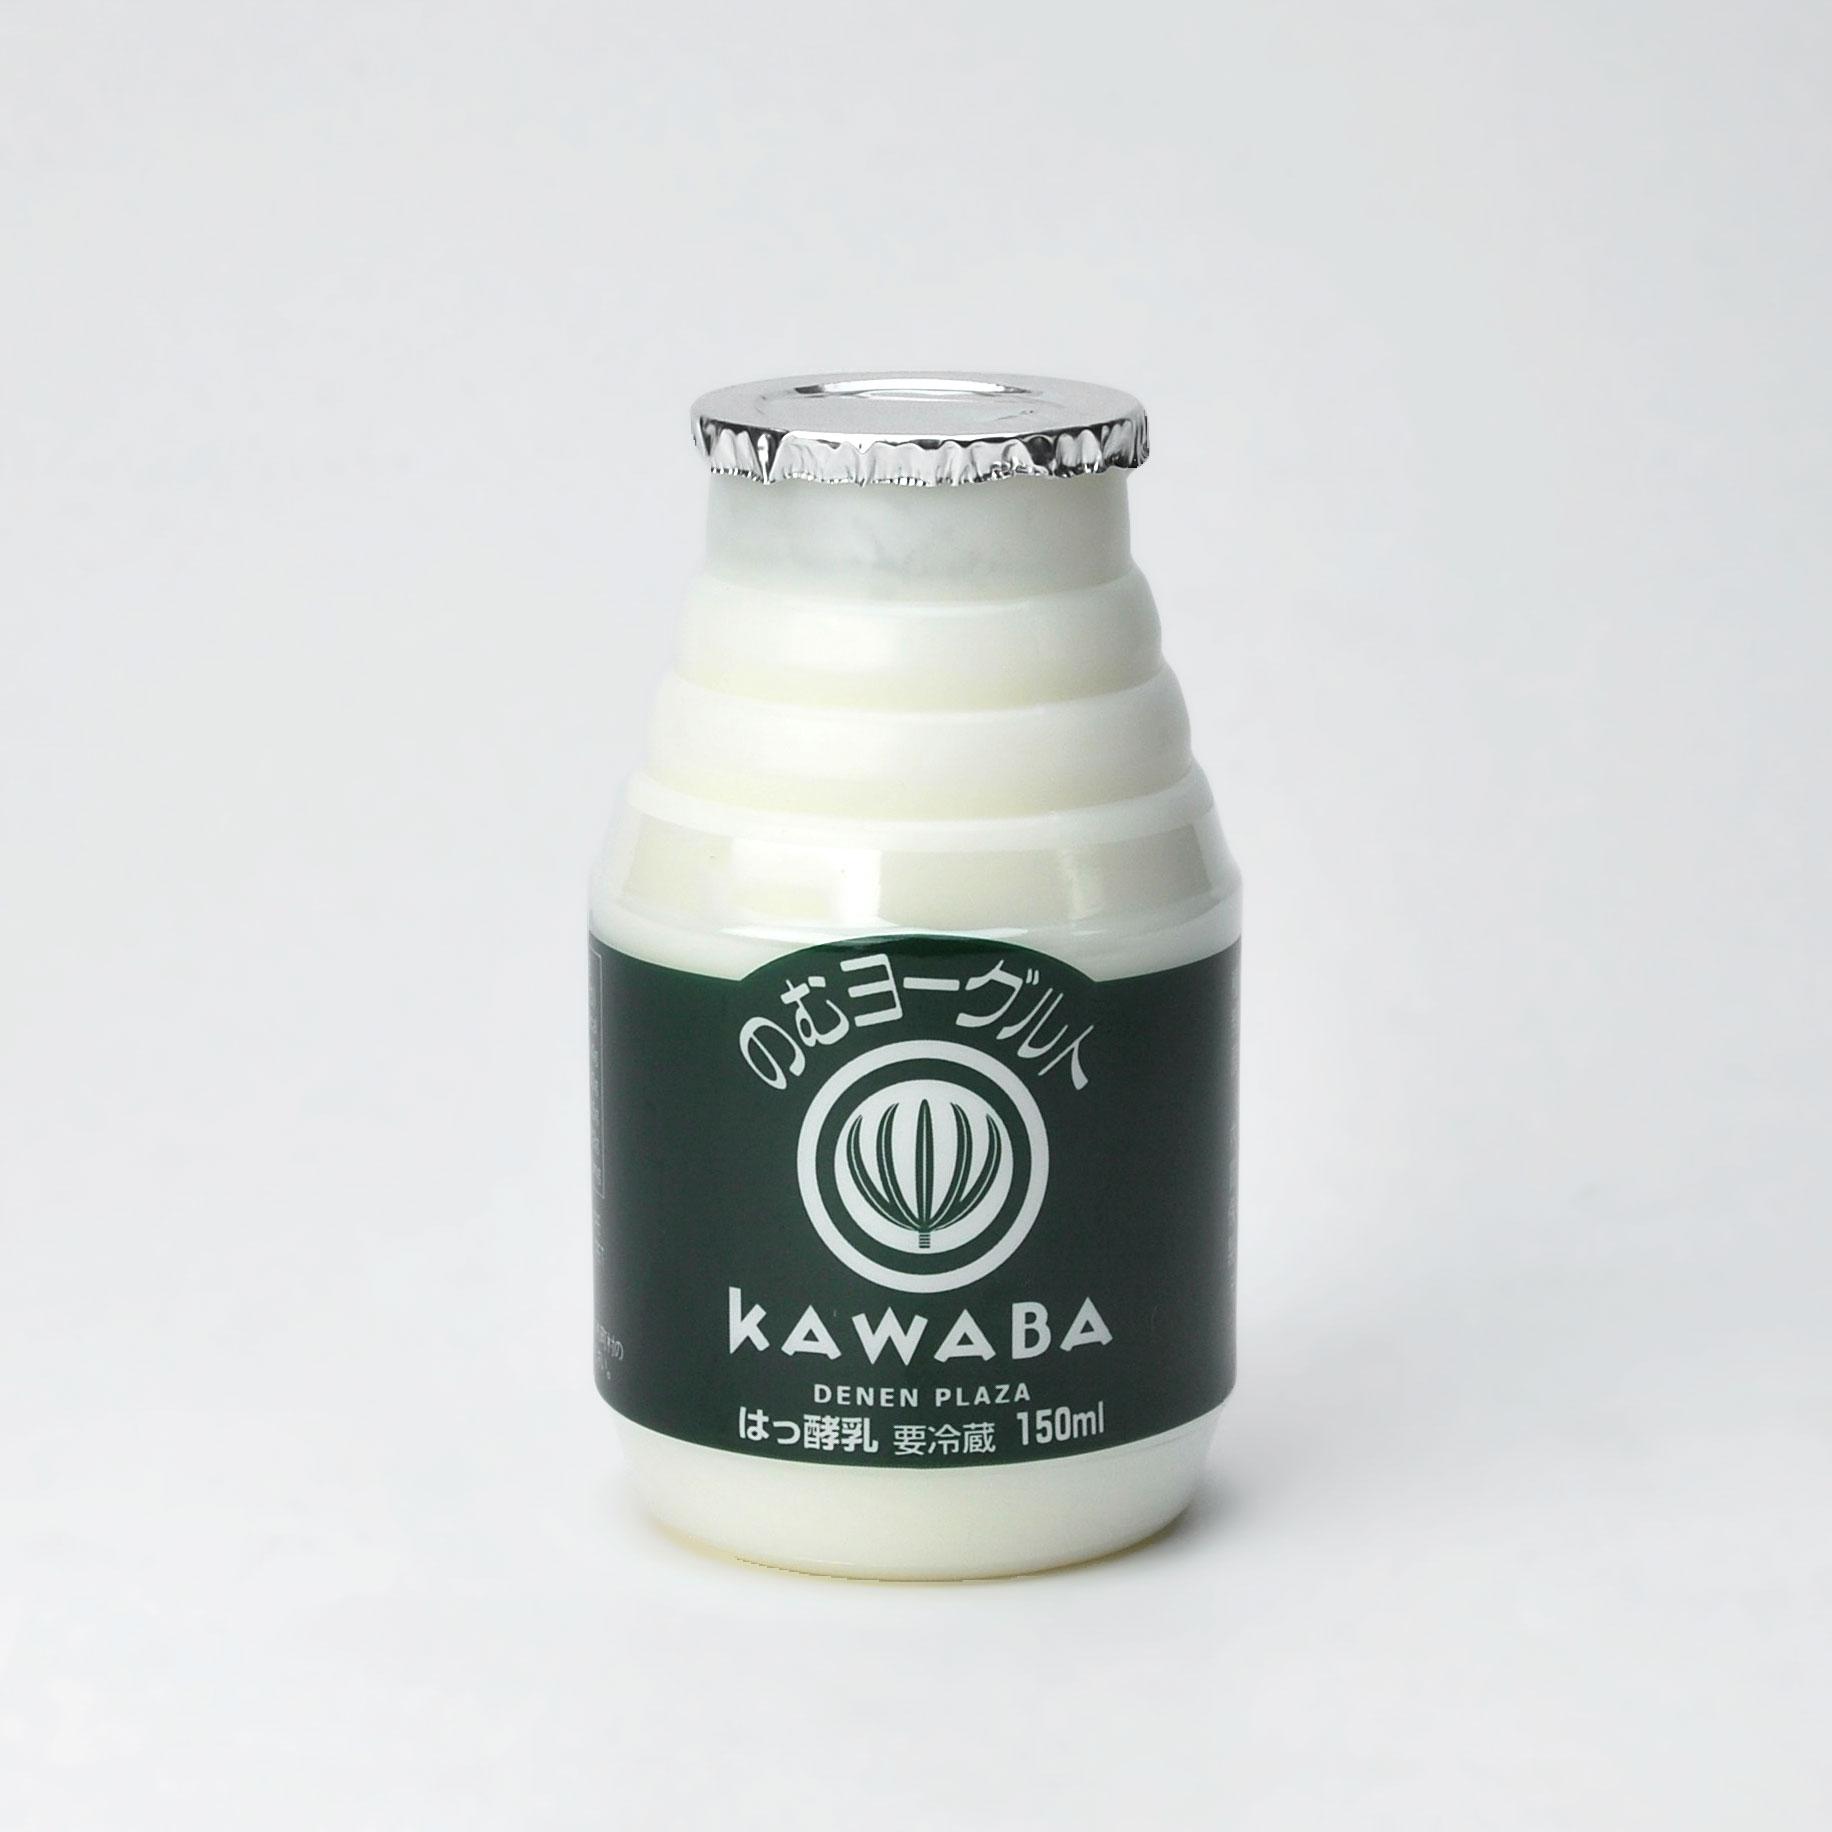 KAWABA食パンセット の商品詳細イメージ-712